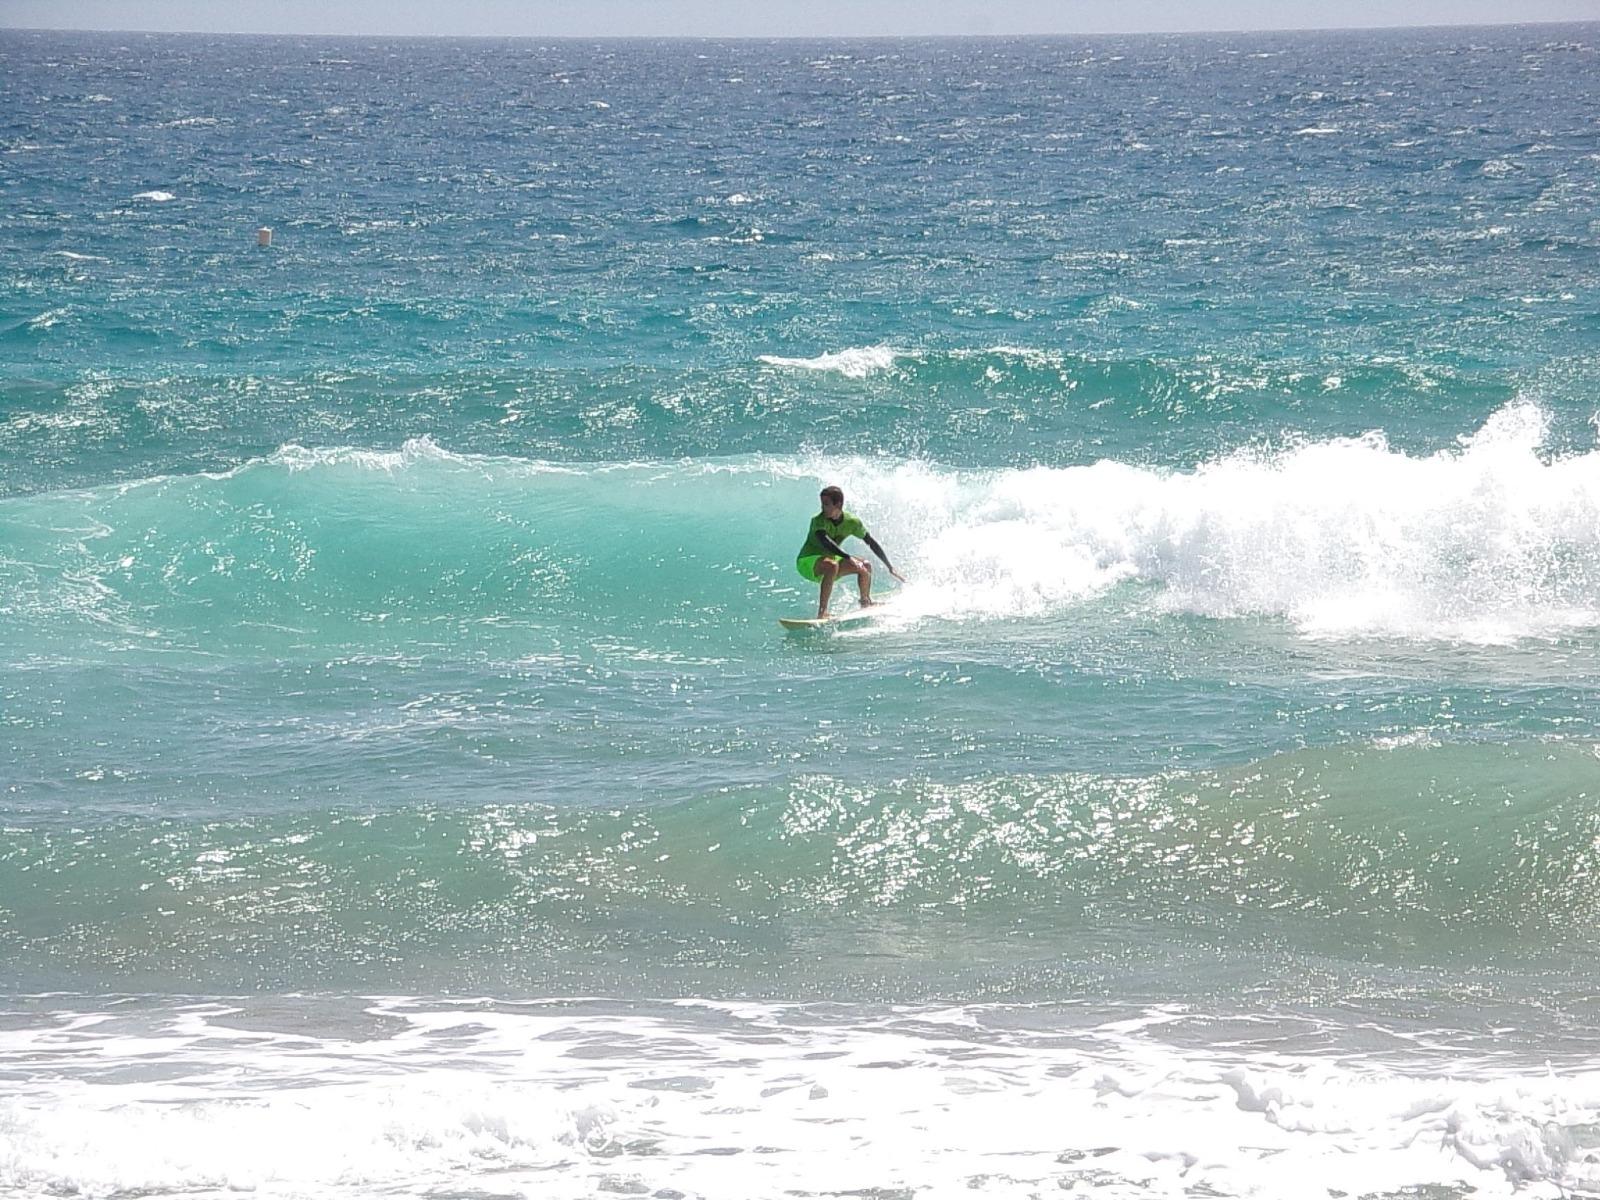 VERANO 2019 2 FUERTE TRIBU SURFWhatsApp Image 2019-08-15 at 15.49.38.jpeg